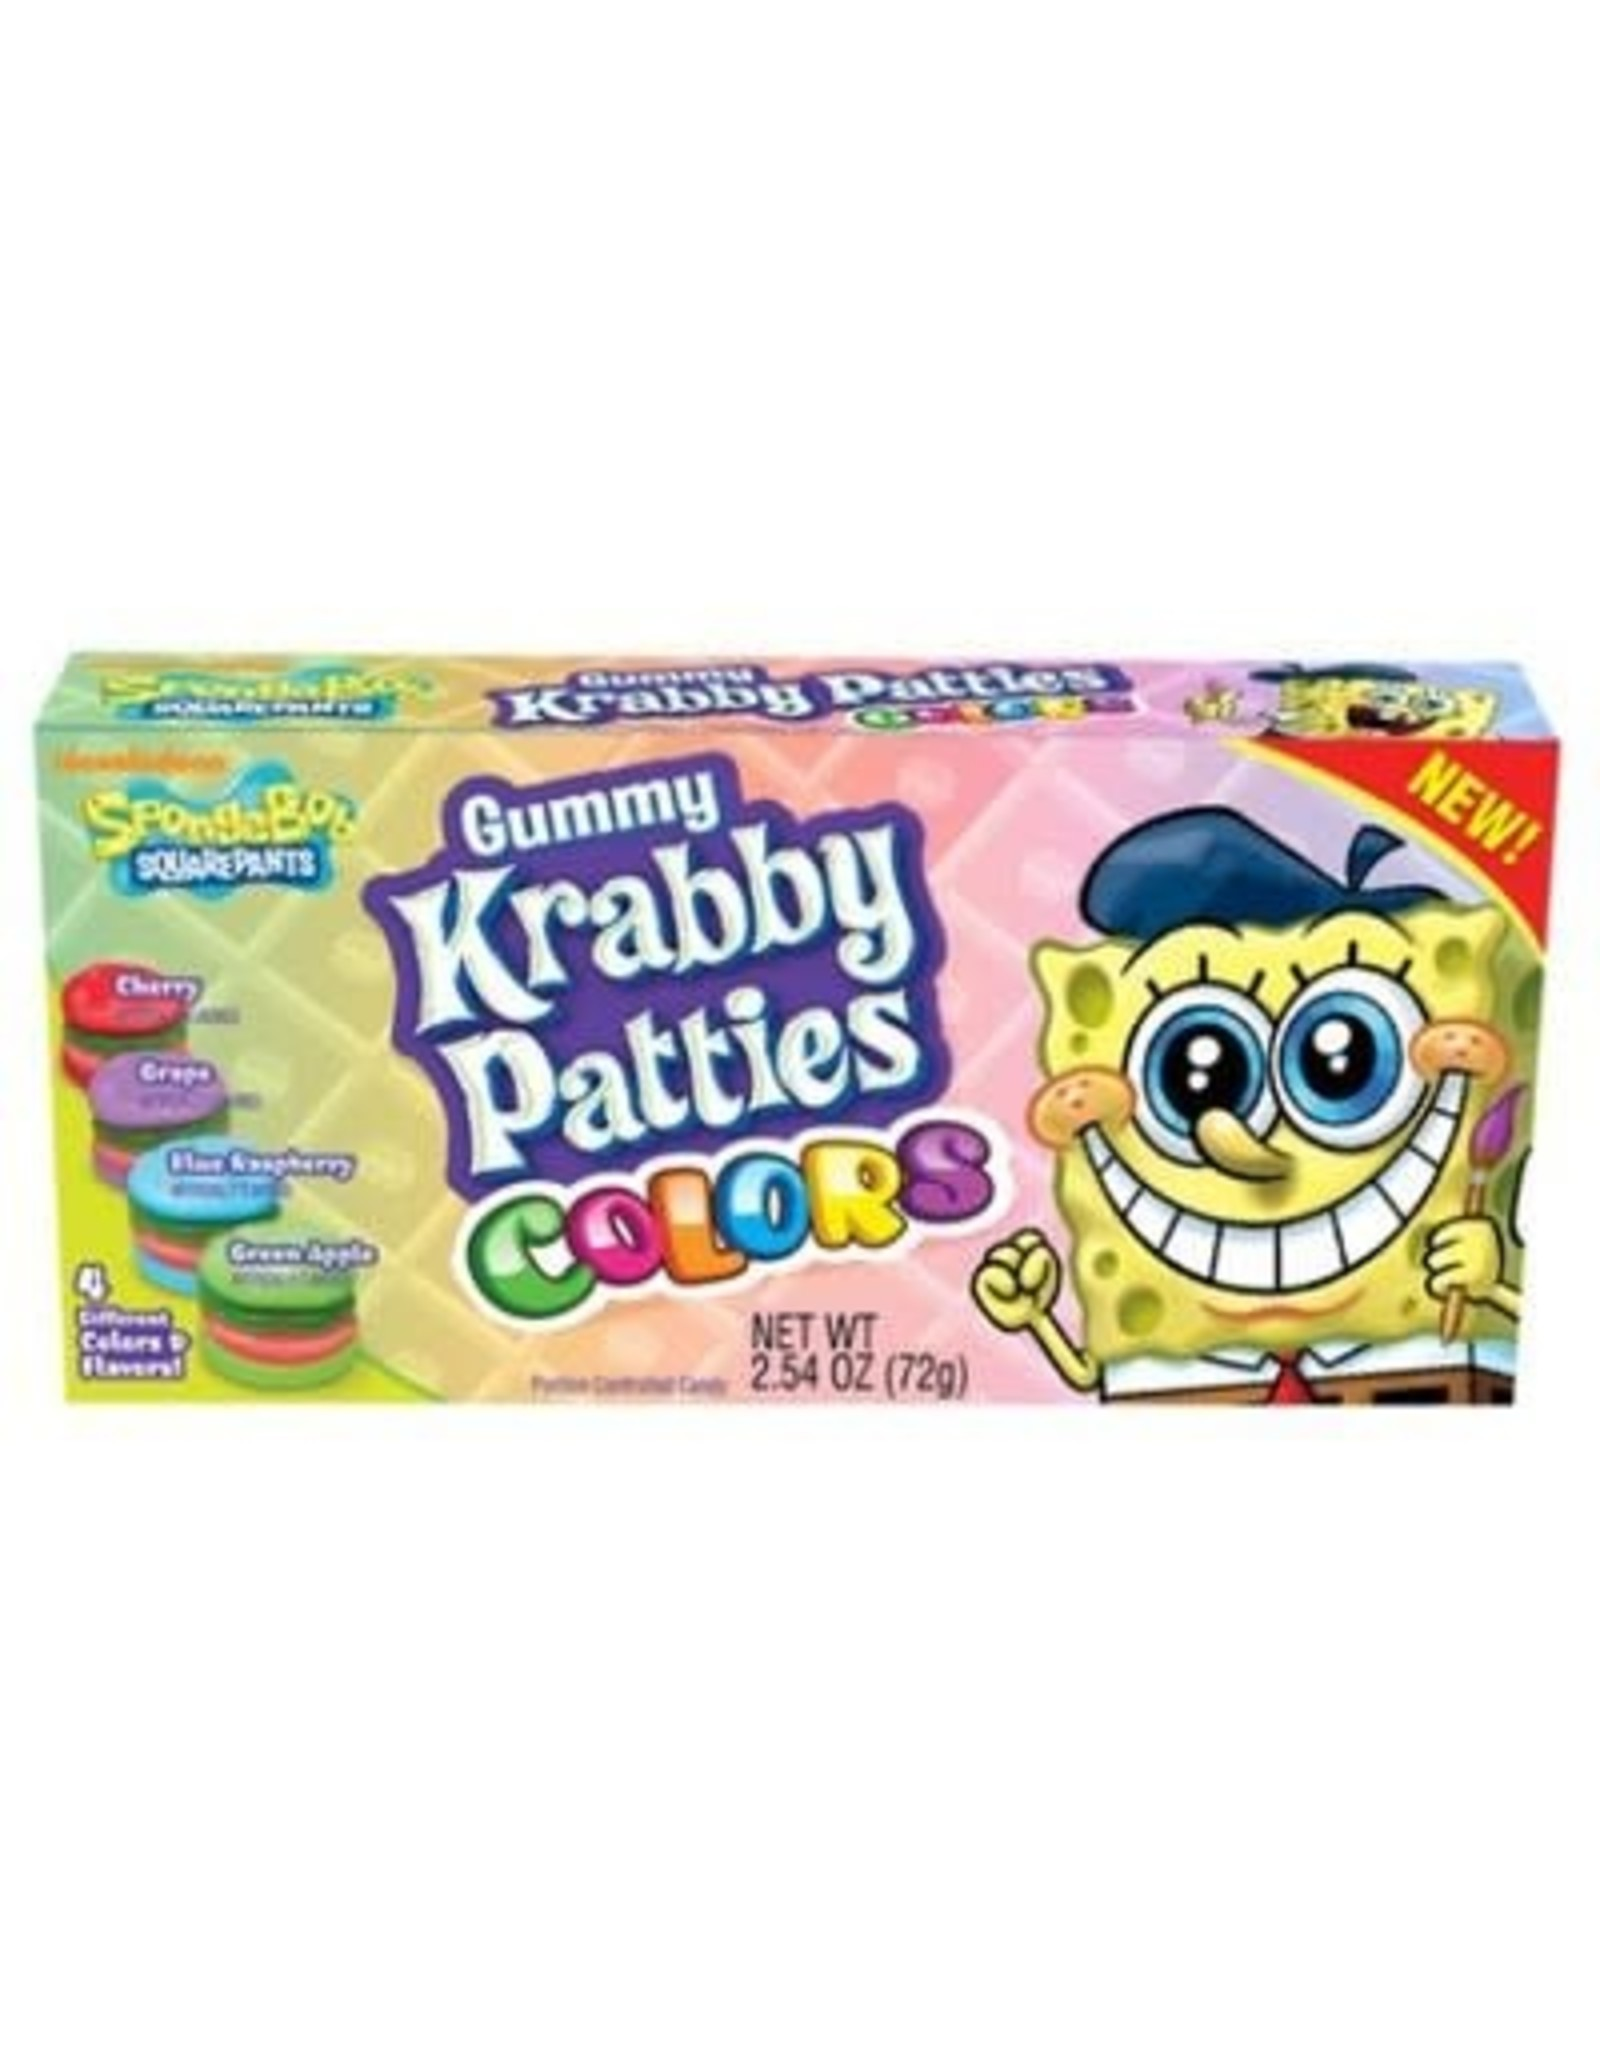 SpongeBob Squarepants Krabby Patties Colors Gummy Candy - 72g